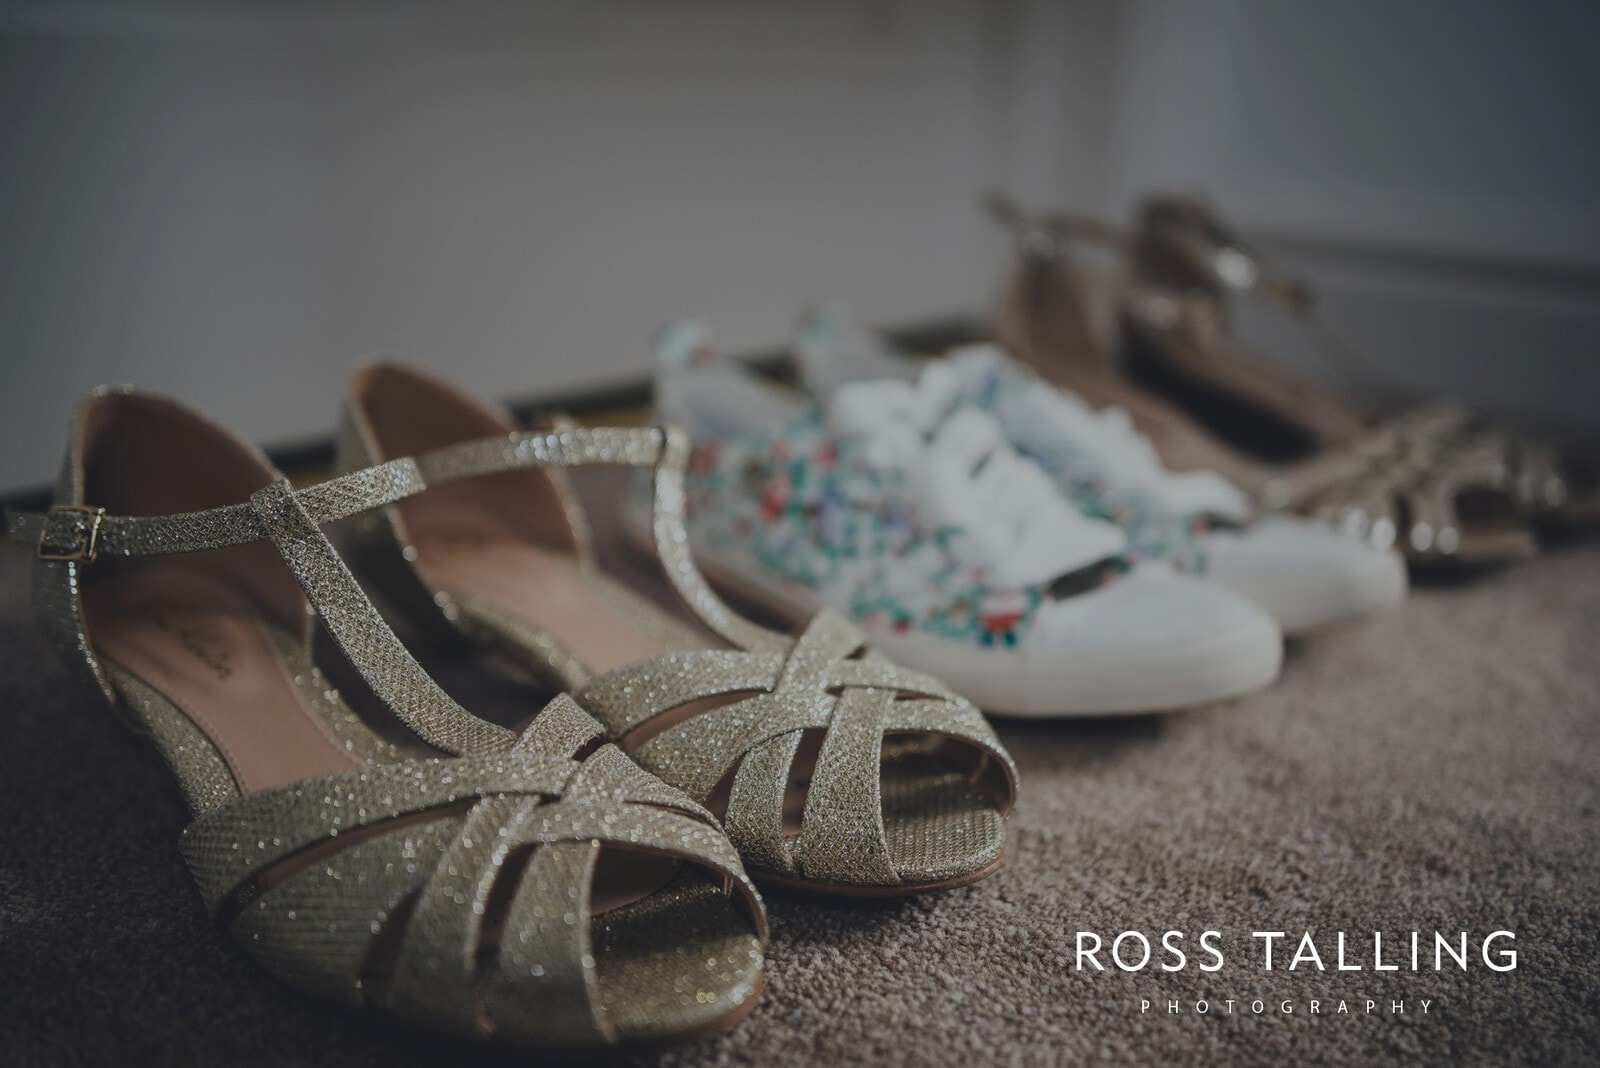 laura-matts-rosevine-hotel-wedding-photography-cornwall_0012